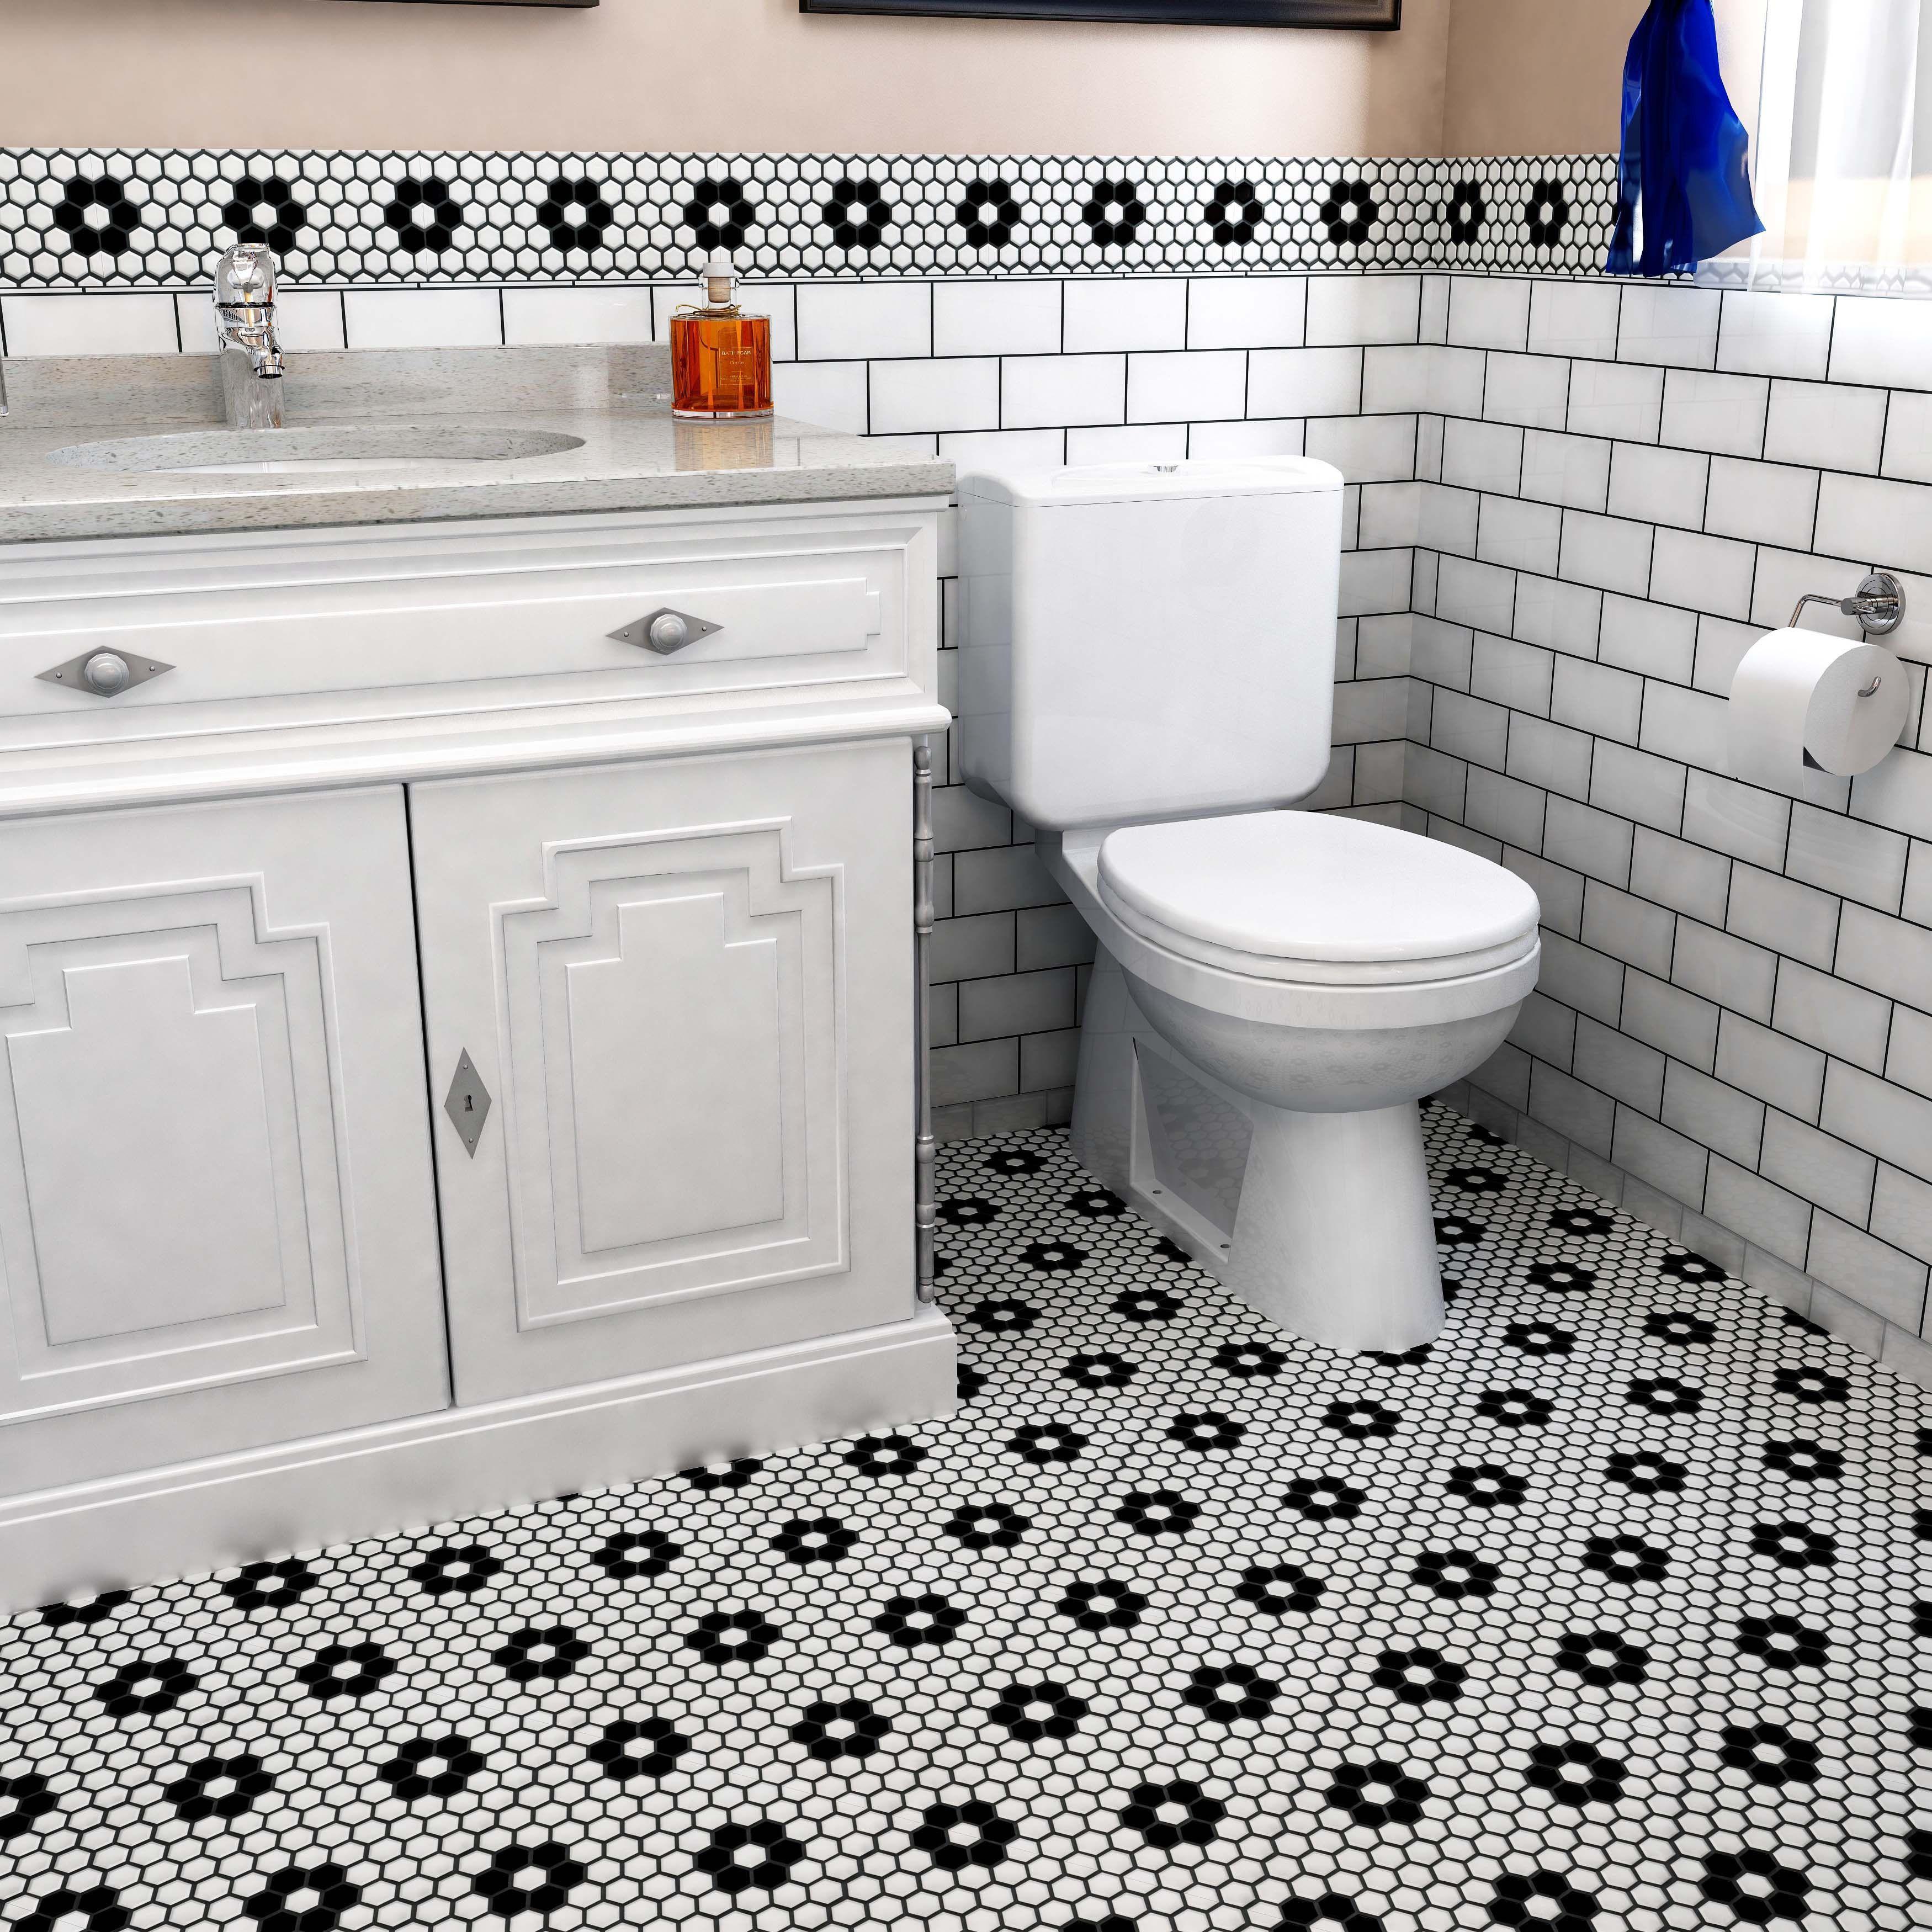 12 X 24 Porcelain Tile In Brick Lay Pattern Brick Laying Tile Patterns Tile Floor